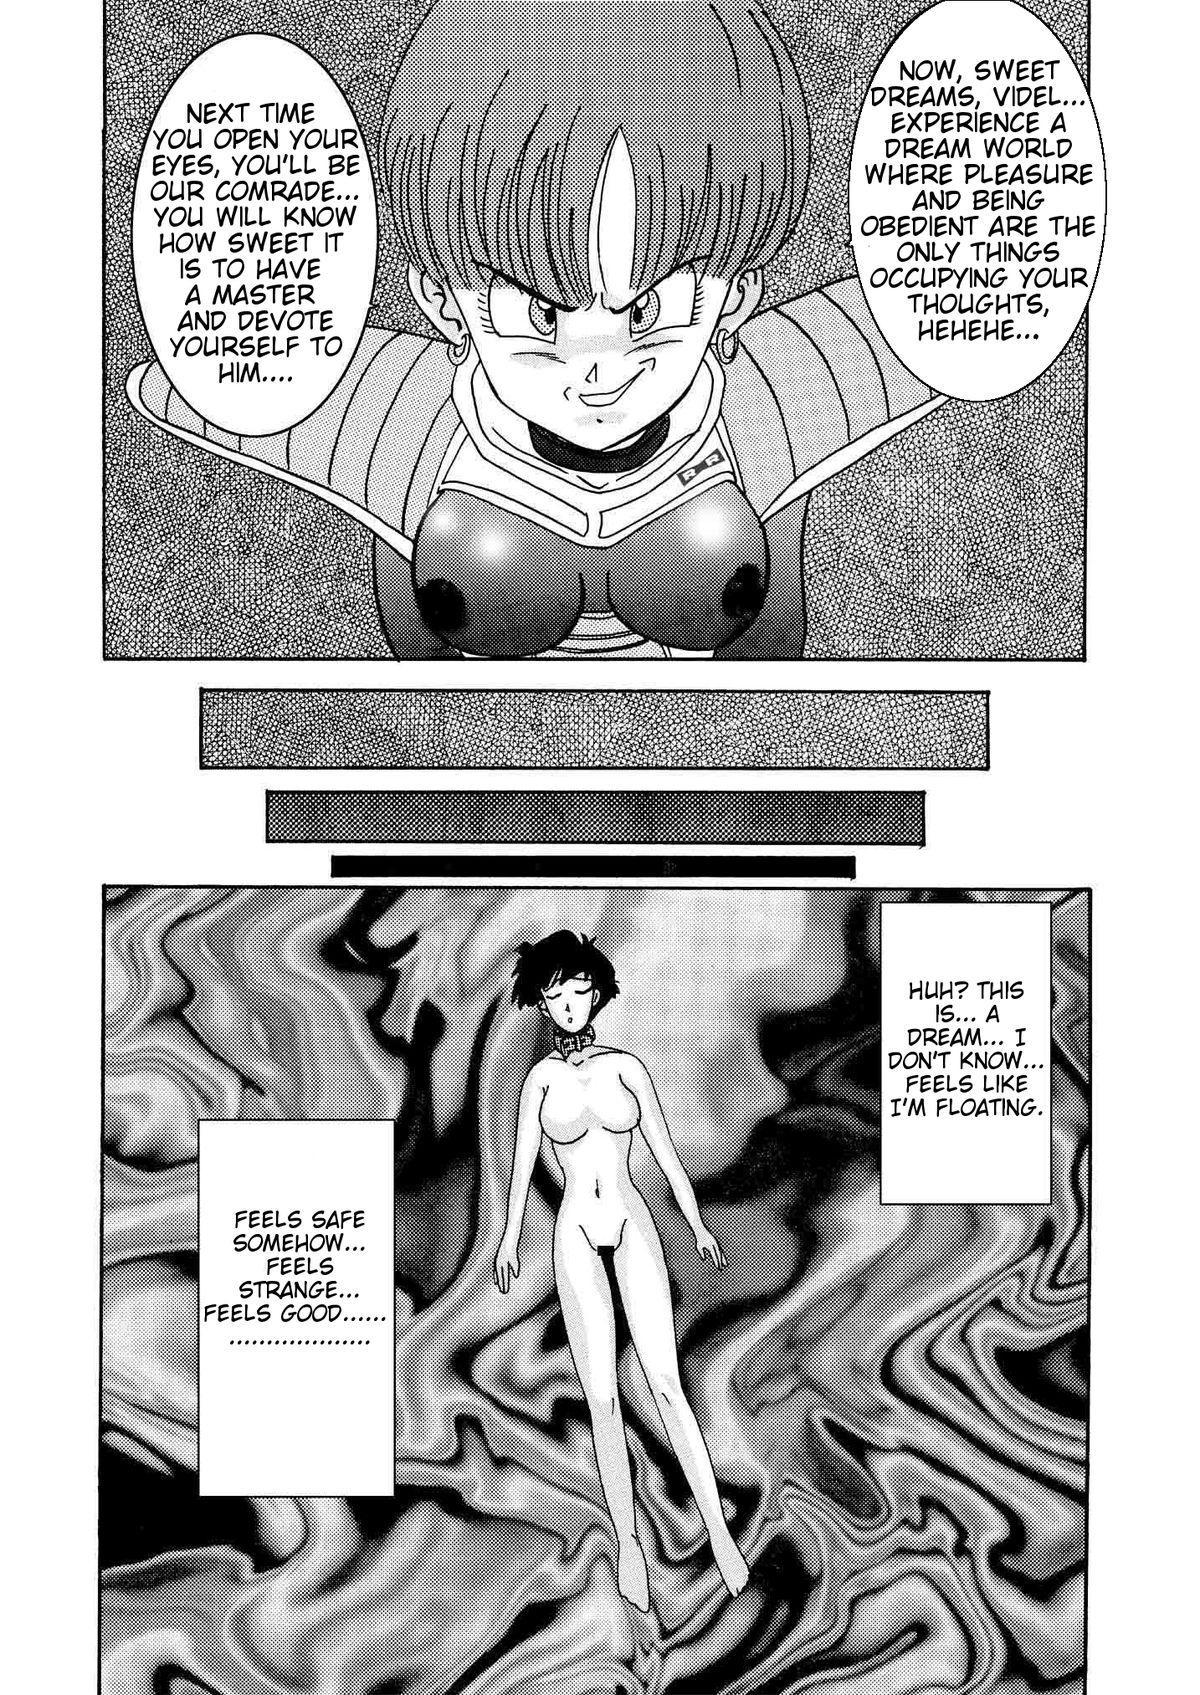 [Light Rate Port Pink] Tanjou!! Aku no Onna Senshi - Videl Sennou Kaizou Keikaku | Birth of an evil female soldier - The Videl brainwashing project  (Dragon Ball Z) [English] [DarkSpooky] 14